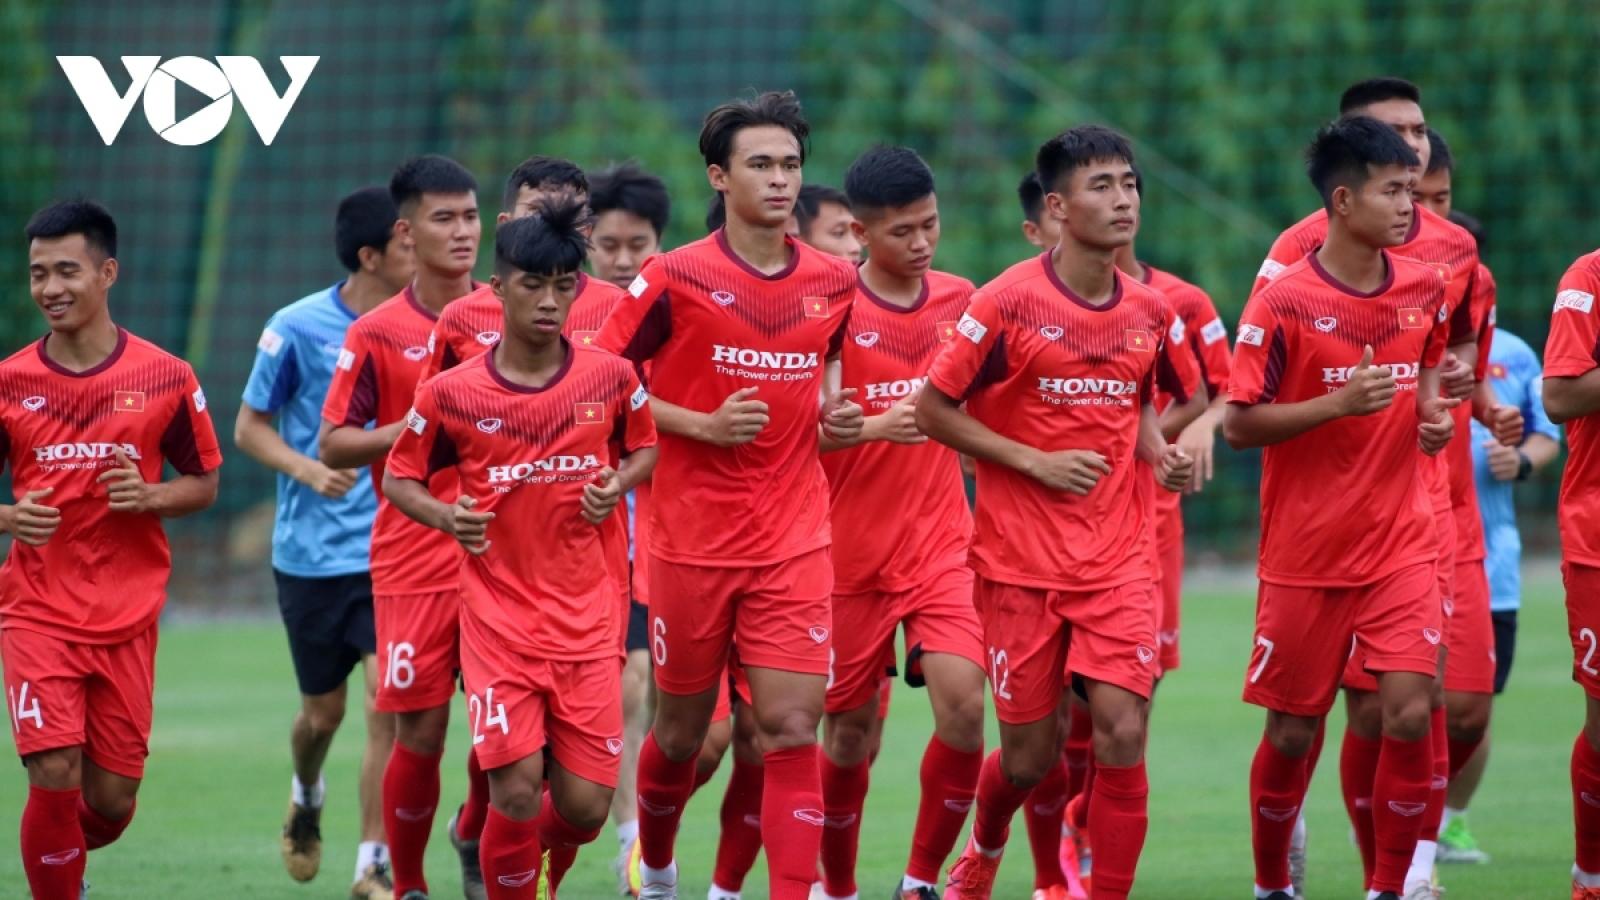 National U23 side to train hard ahead of Asian qualifiers